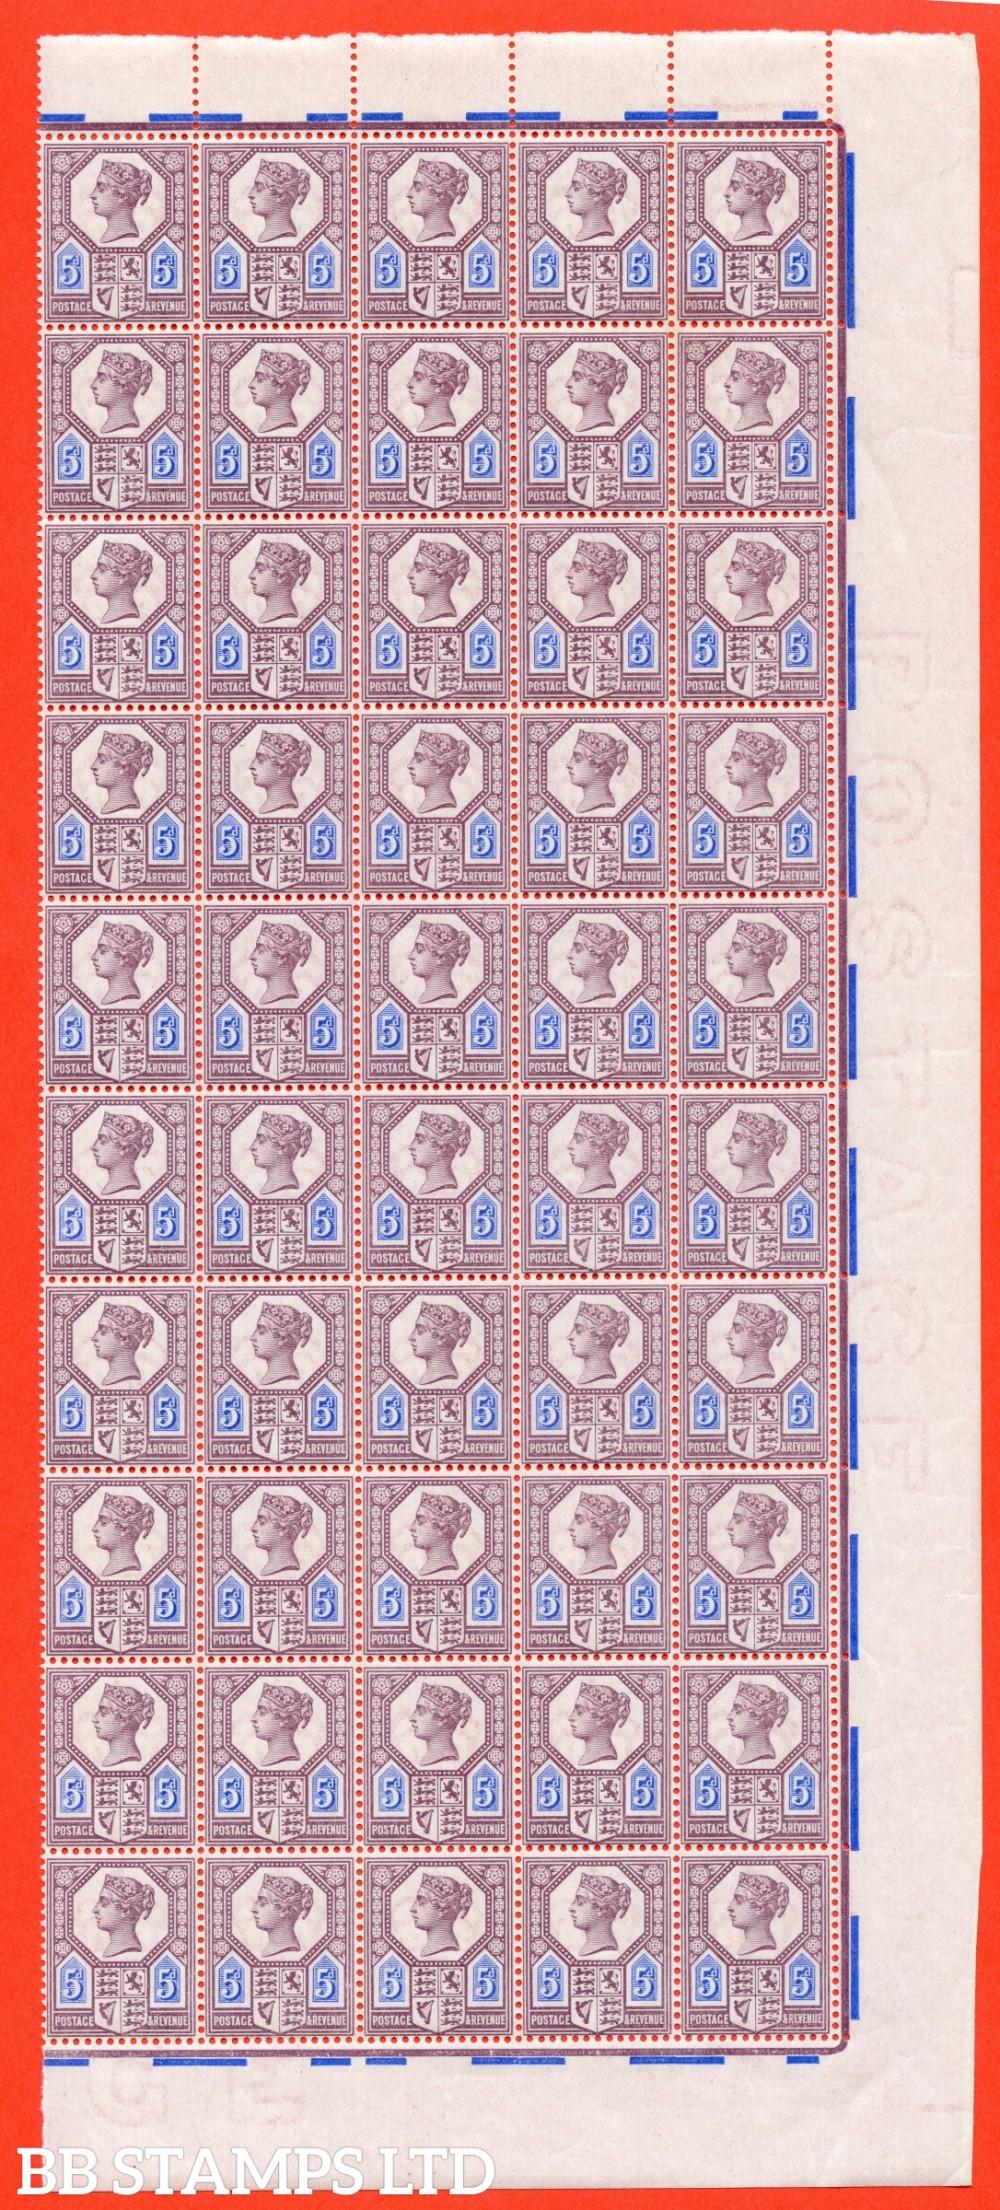 SG. 207a. K36 (1). 5d Dull Purple & Blue ( Die II ). A fine UNMOUNTED MINT marginal block of 50. A RARE multiple.